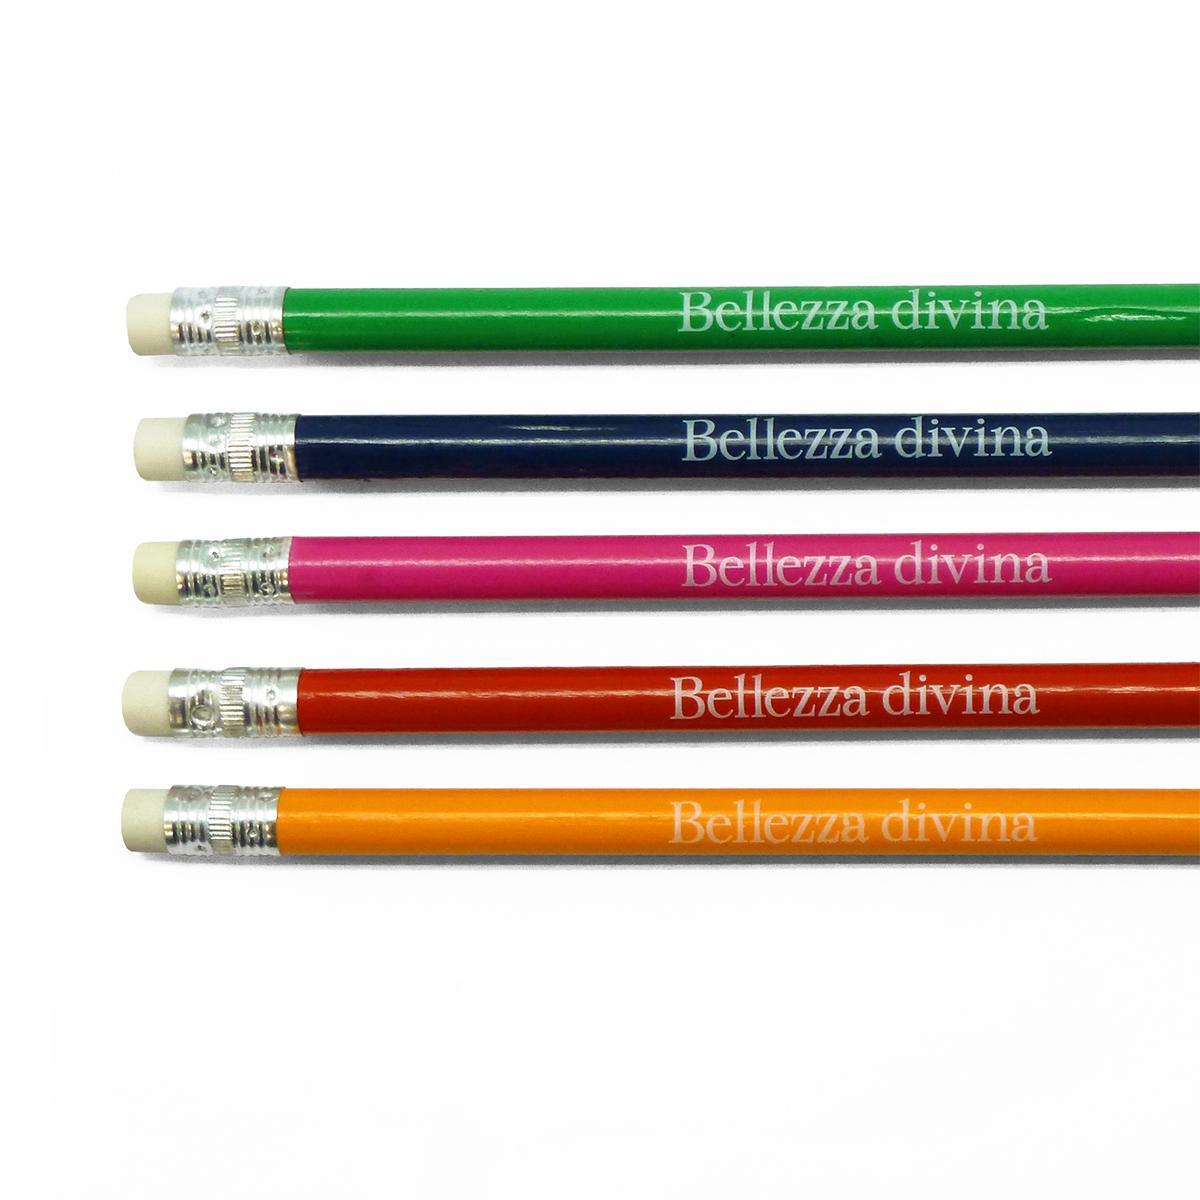 matite-marsilio-editori